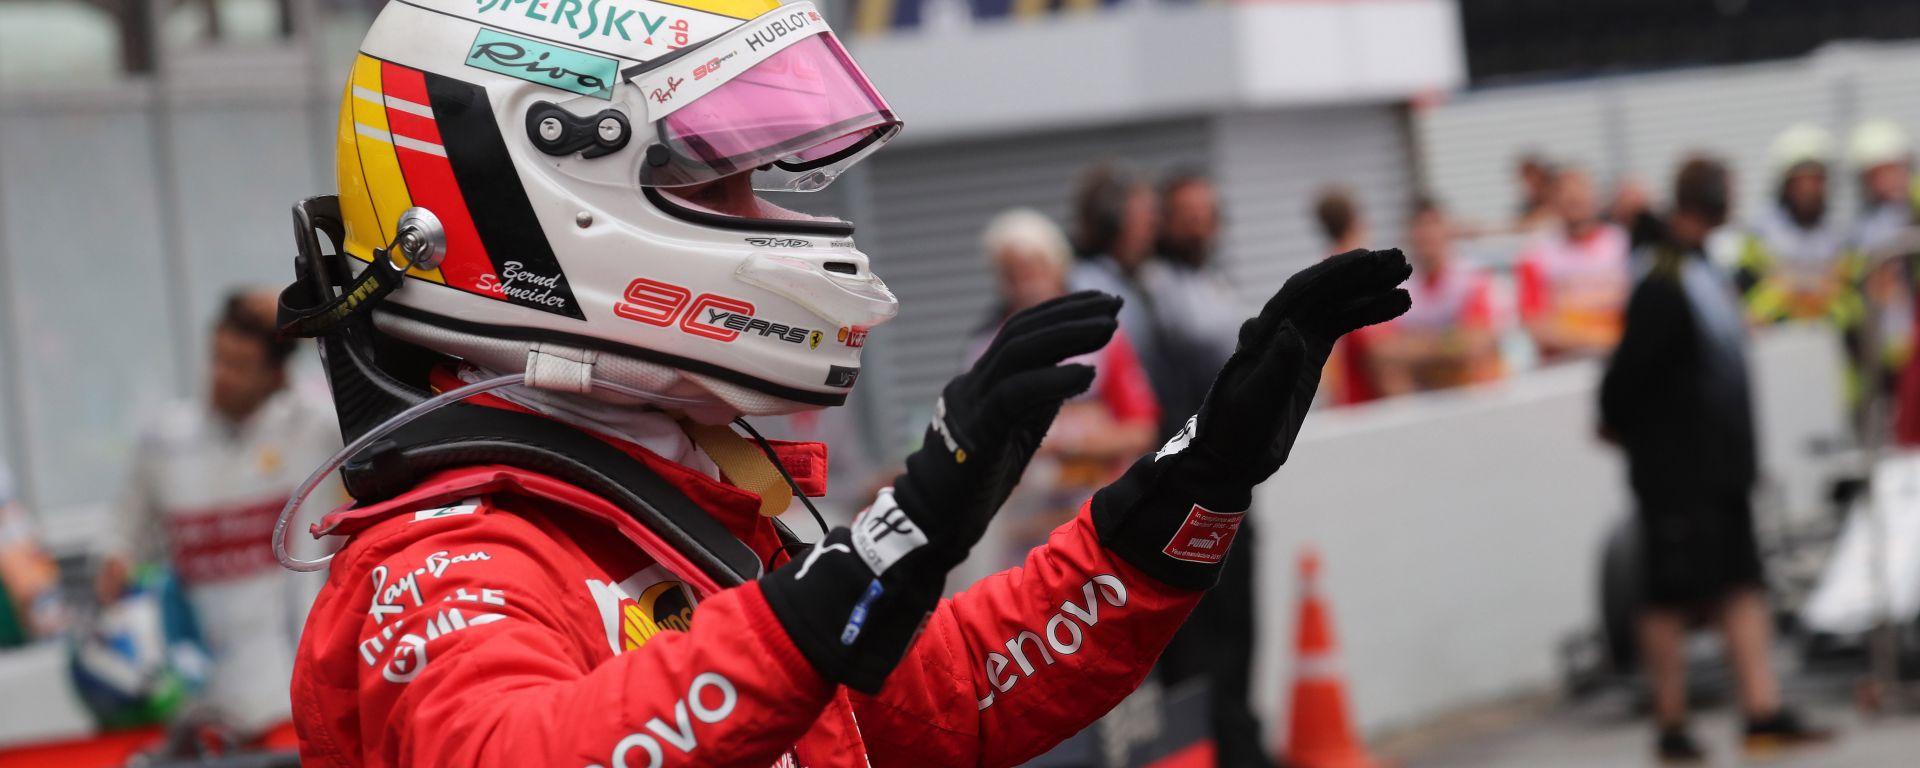 F1 GP Germania 2019, Sebastian Vettel (Ferrari) esulta dopo il secondo posto a Hockenheim